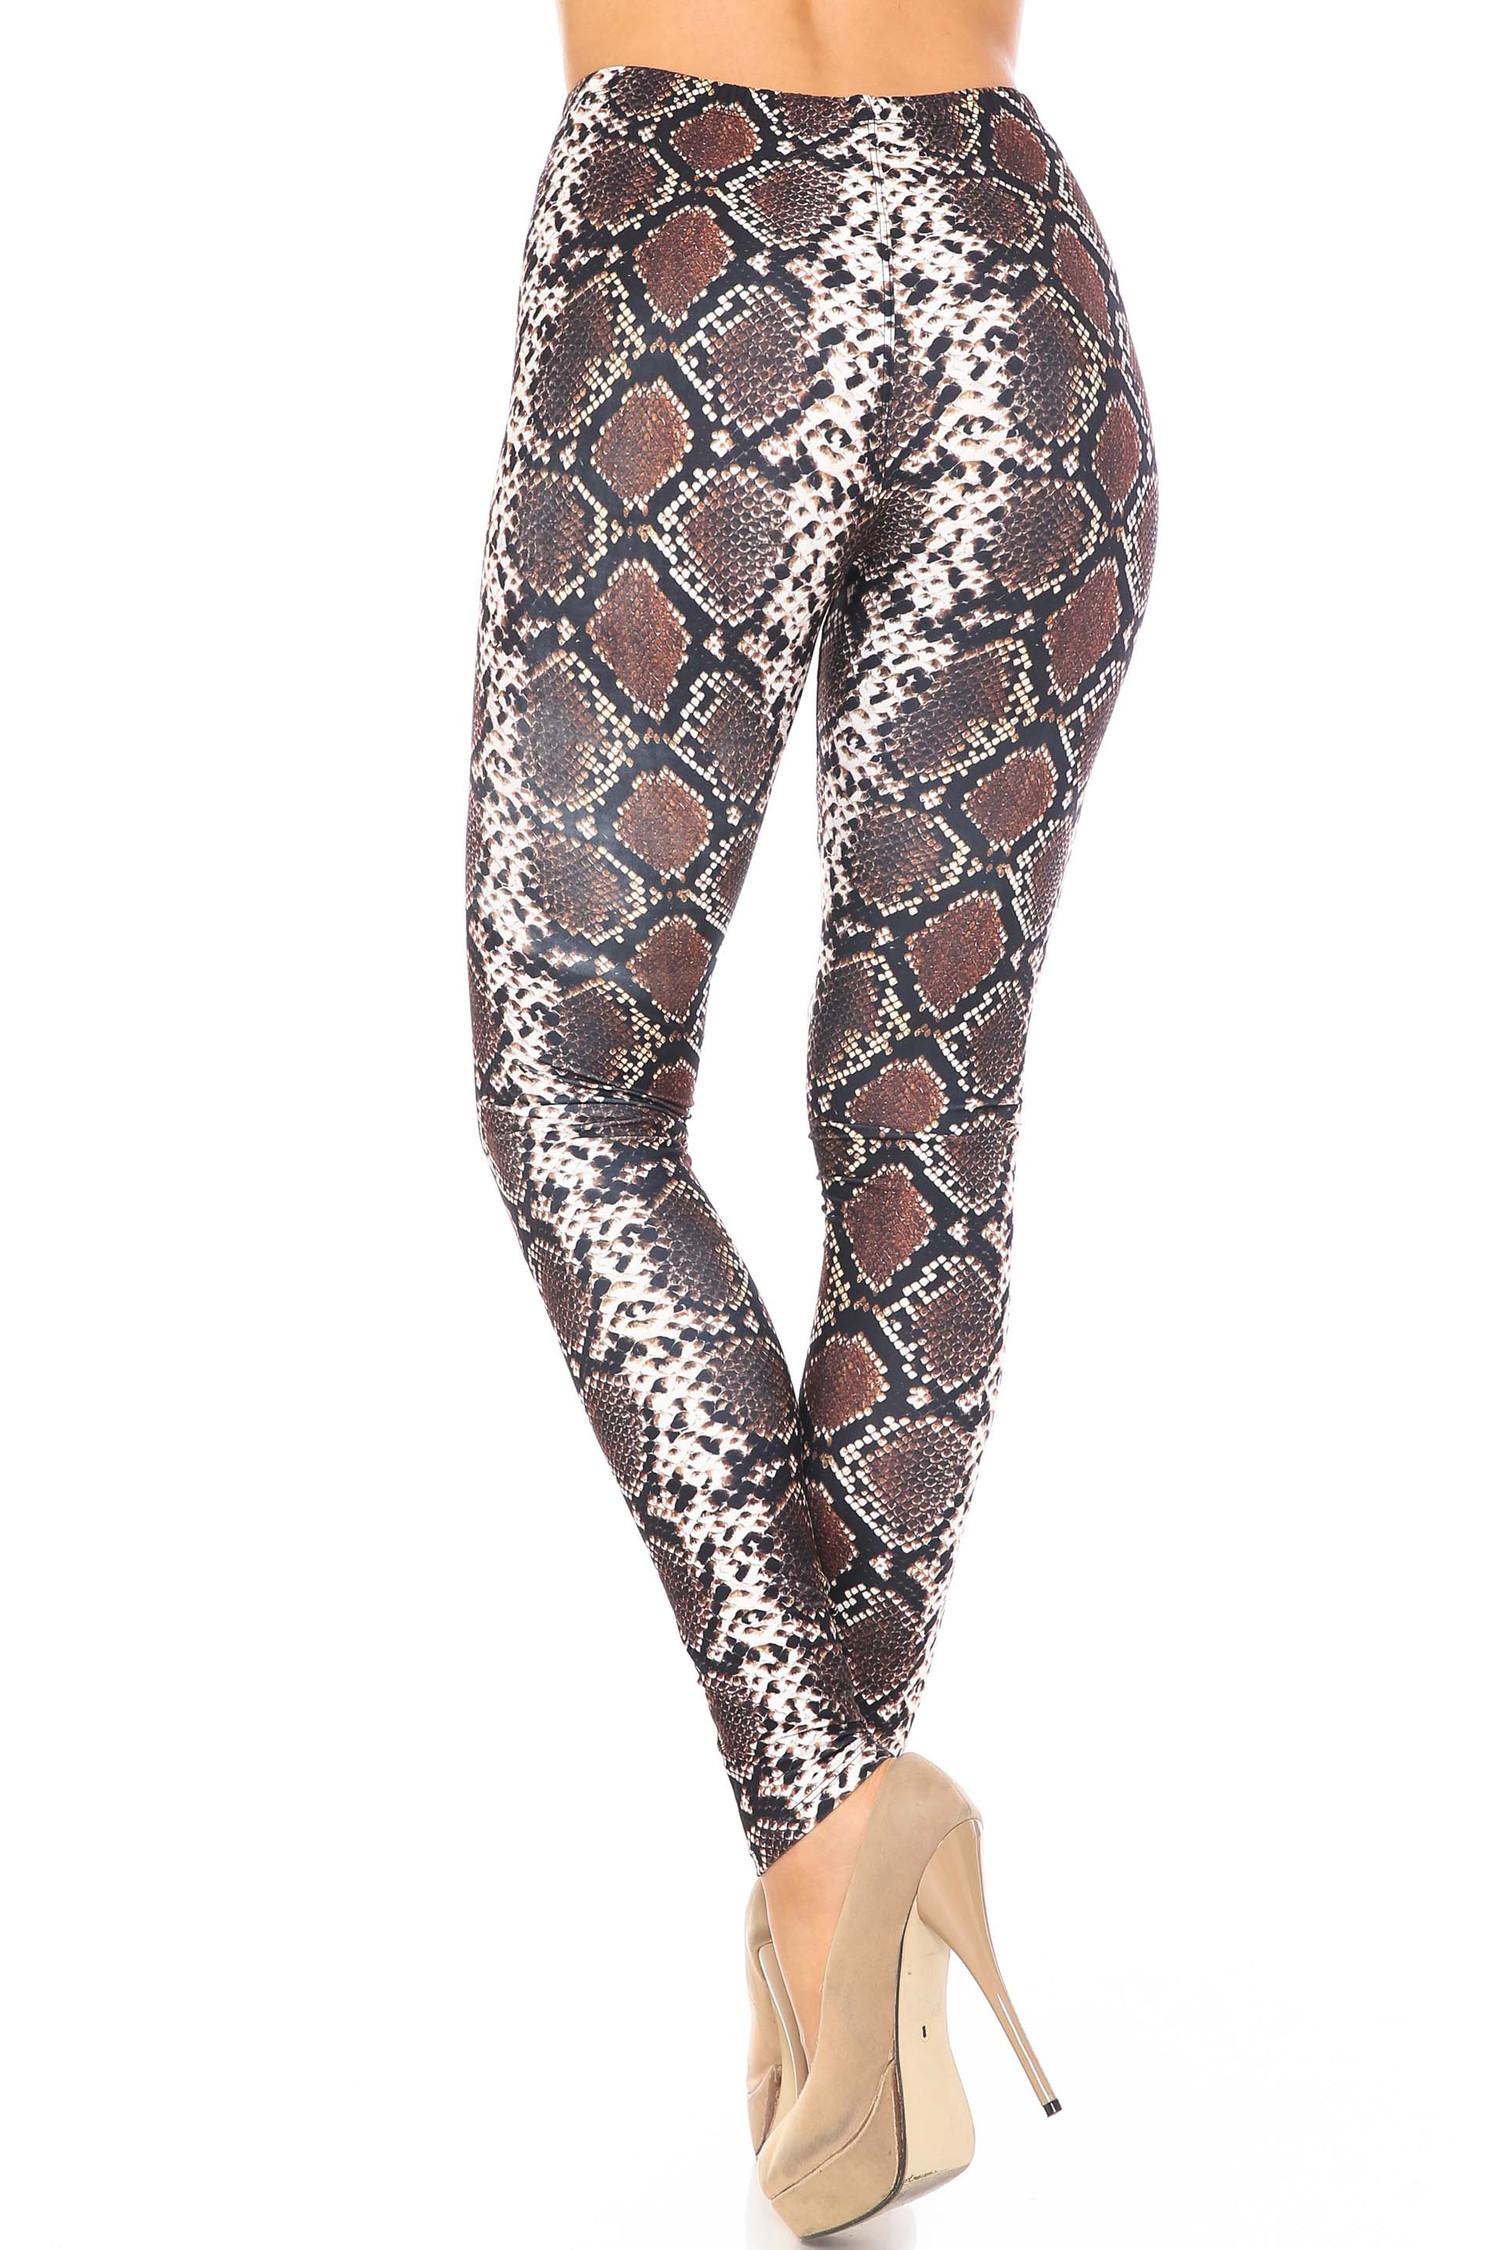 Back side image of Creamy Soft Brown Boa Extra Plus Size Leggings - 3X-5X - USA Fashion™